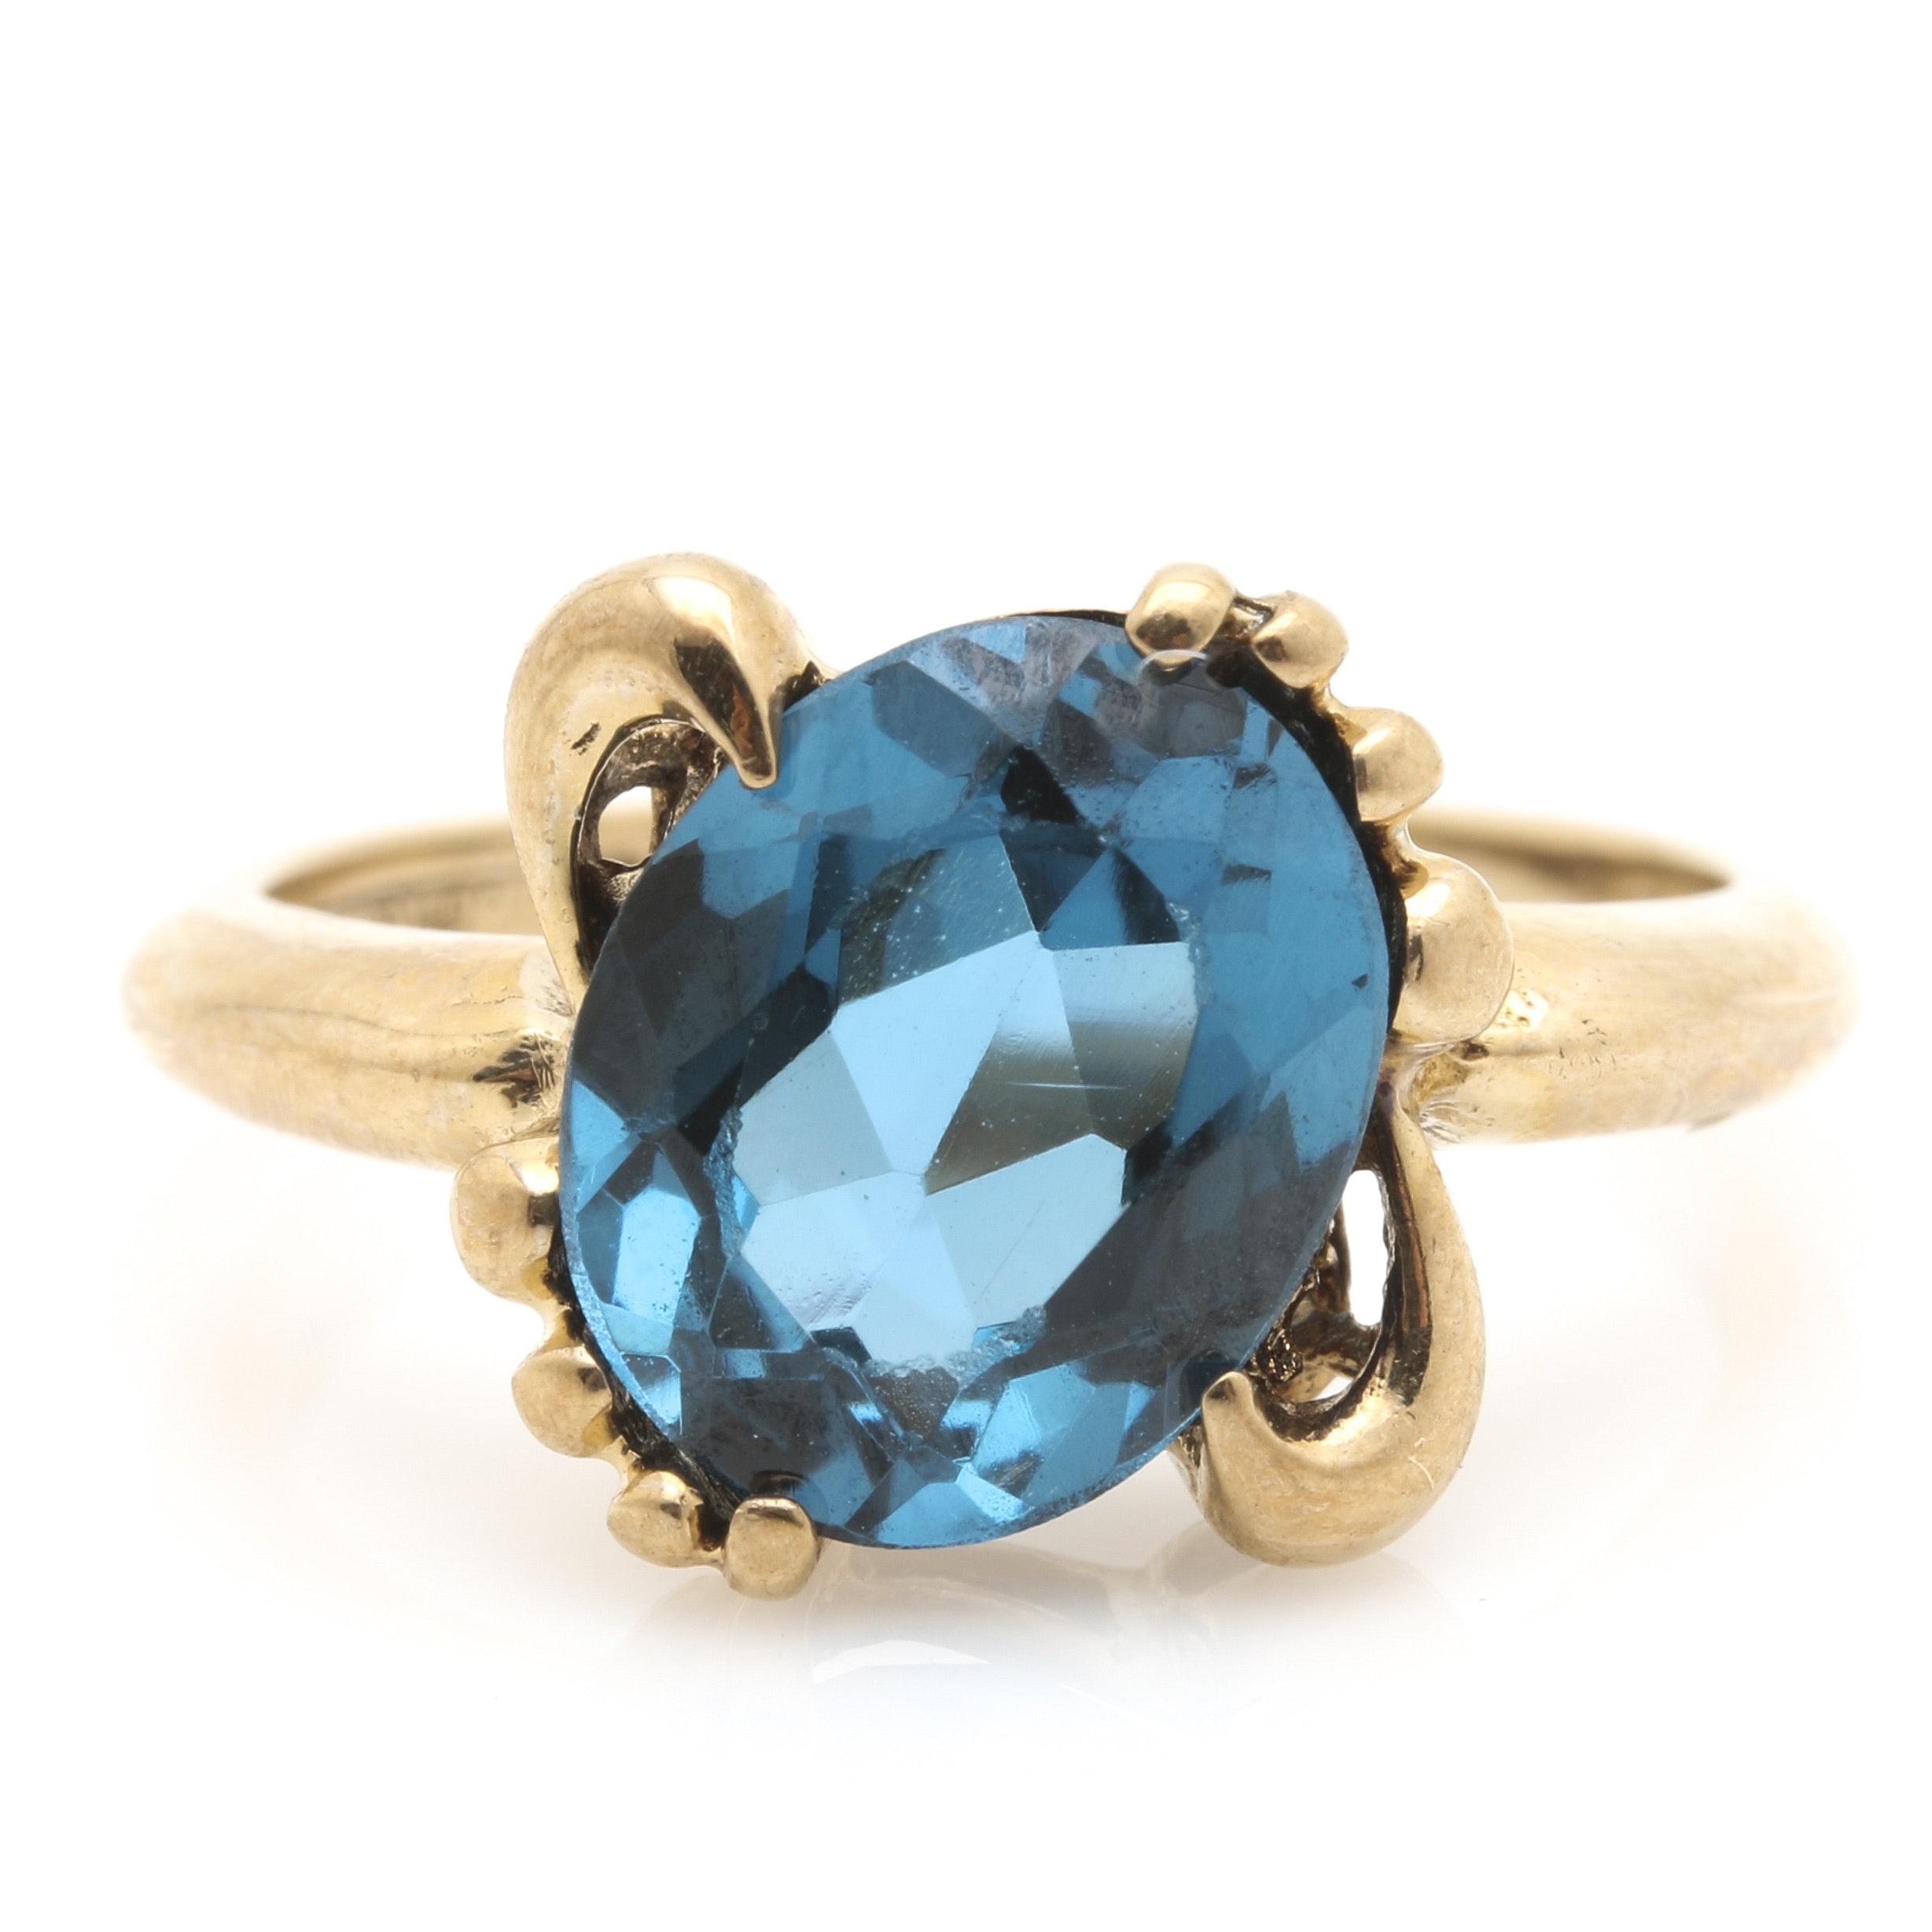 10K Yellow Gold London Blue Topaz Ring